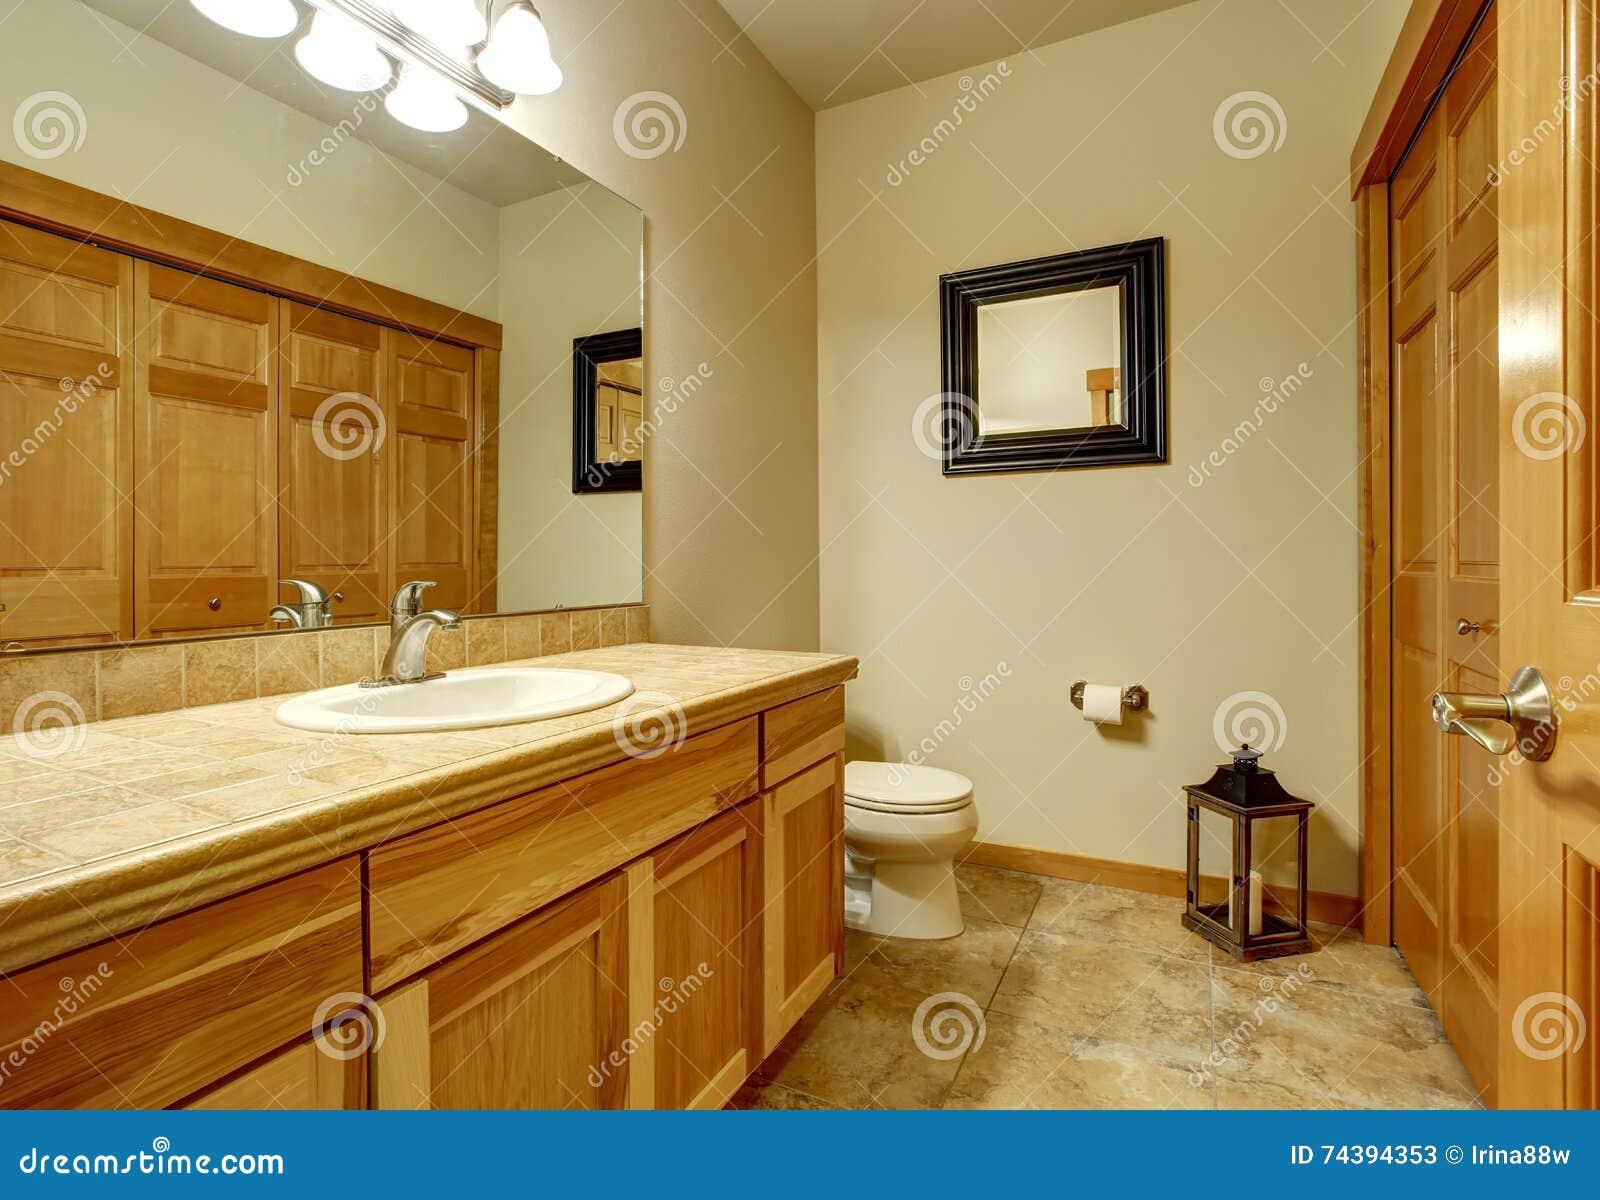 Light Brown Bathroom With Marble Tile Floor And Beige Walls. Stock ...